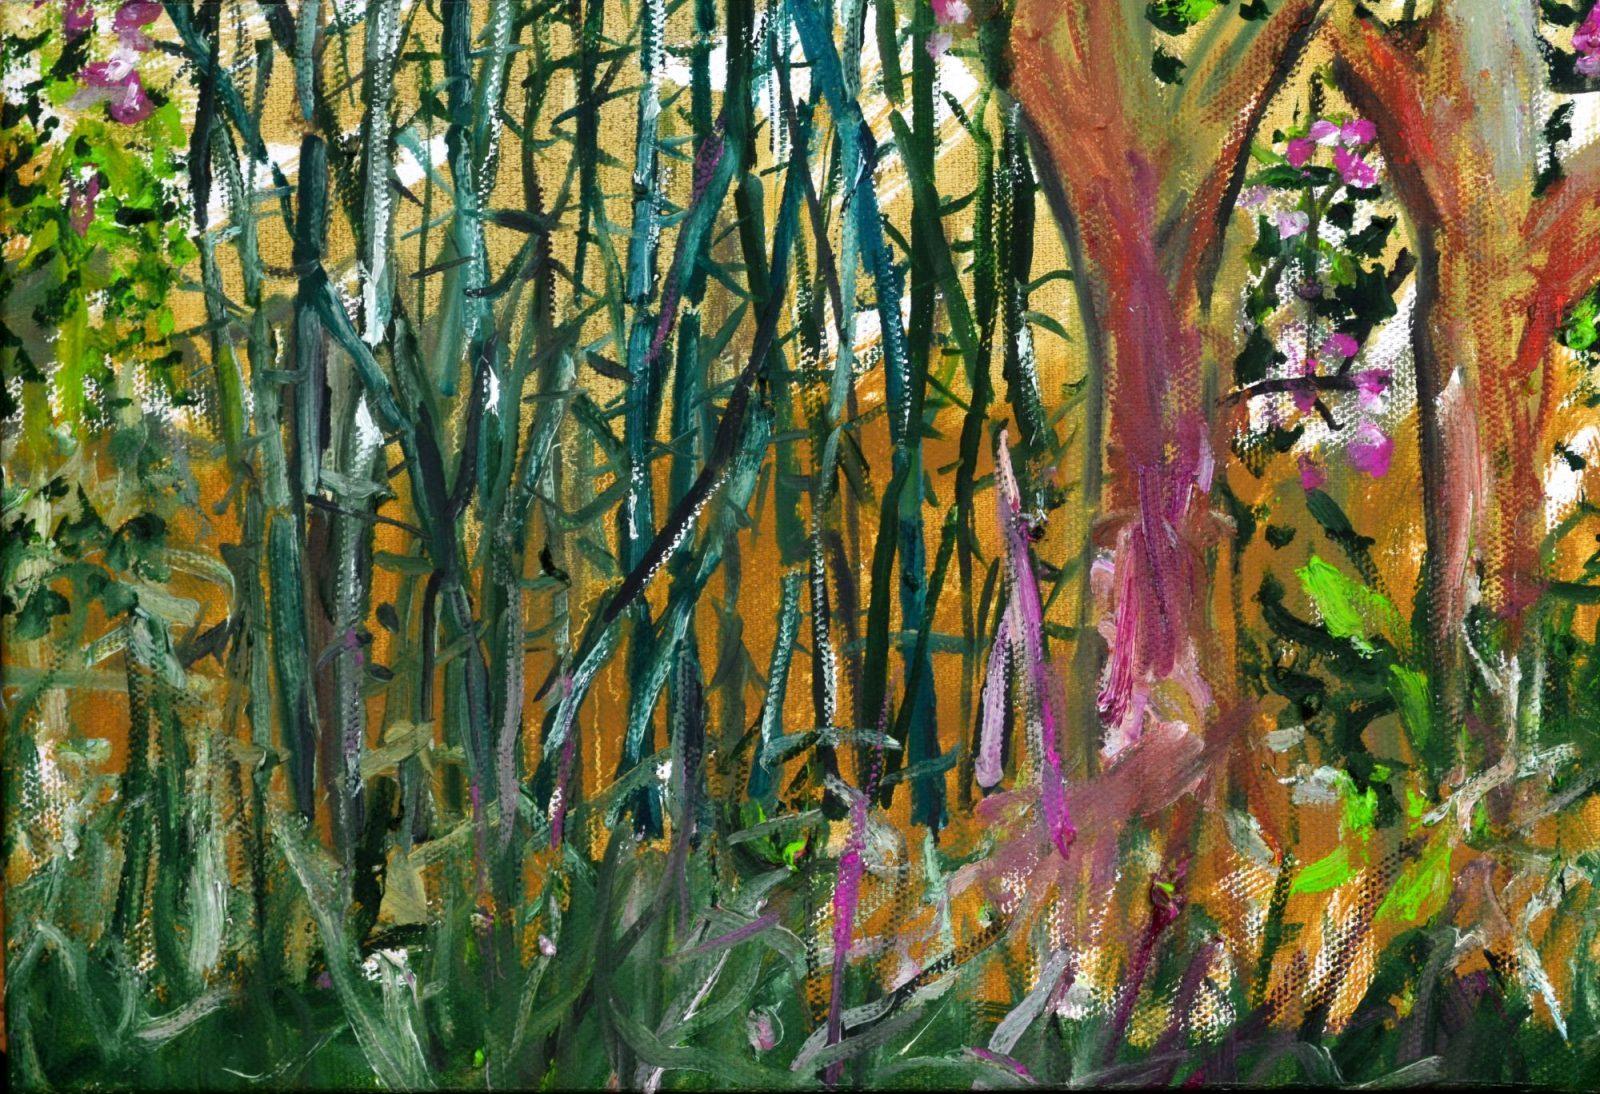 franyo aatoth: Garden Series 24.